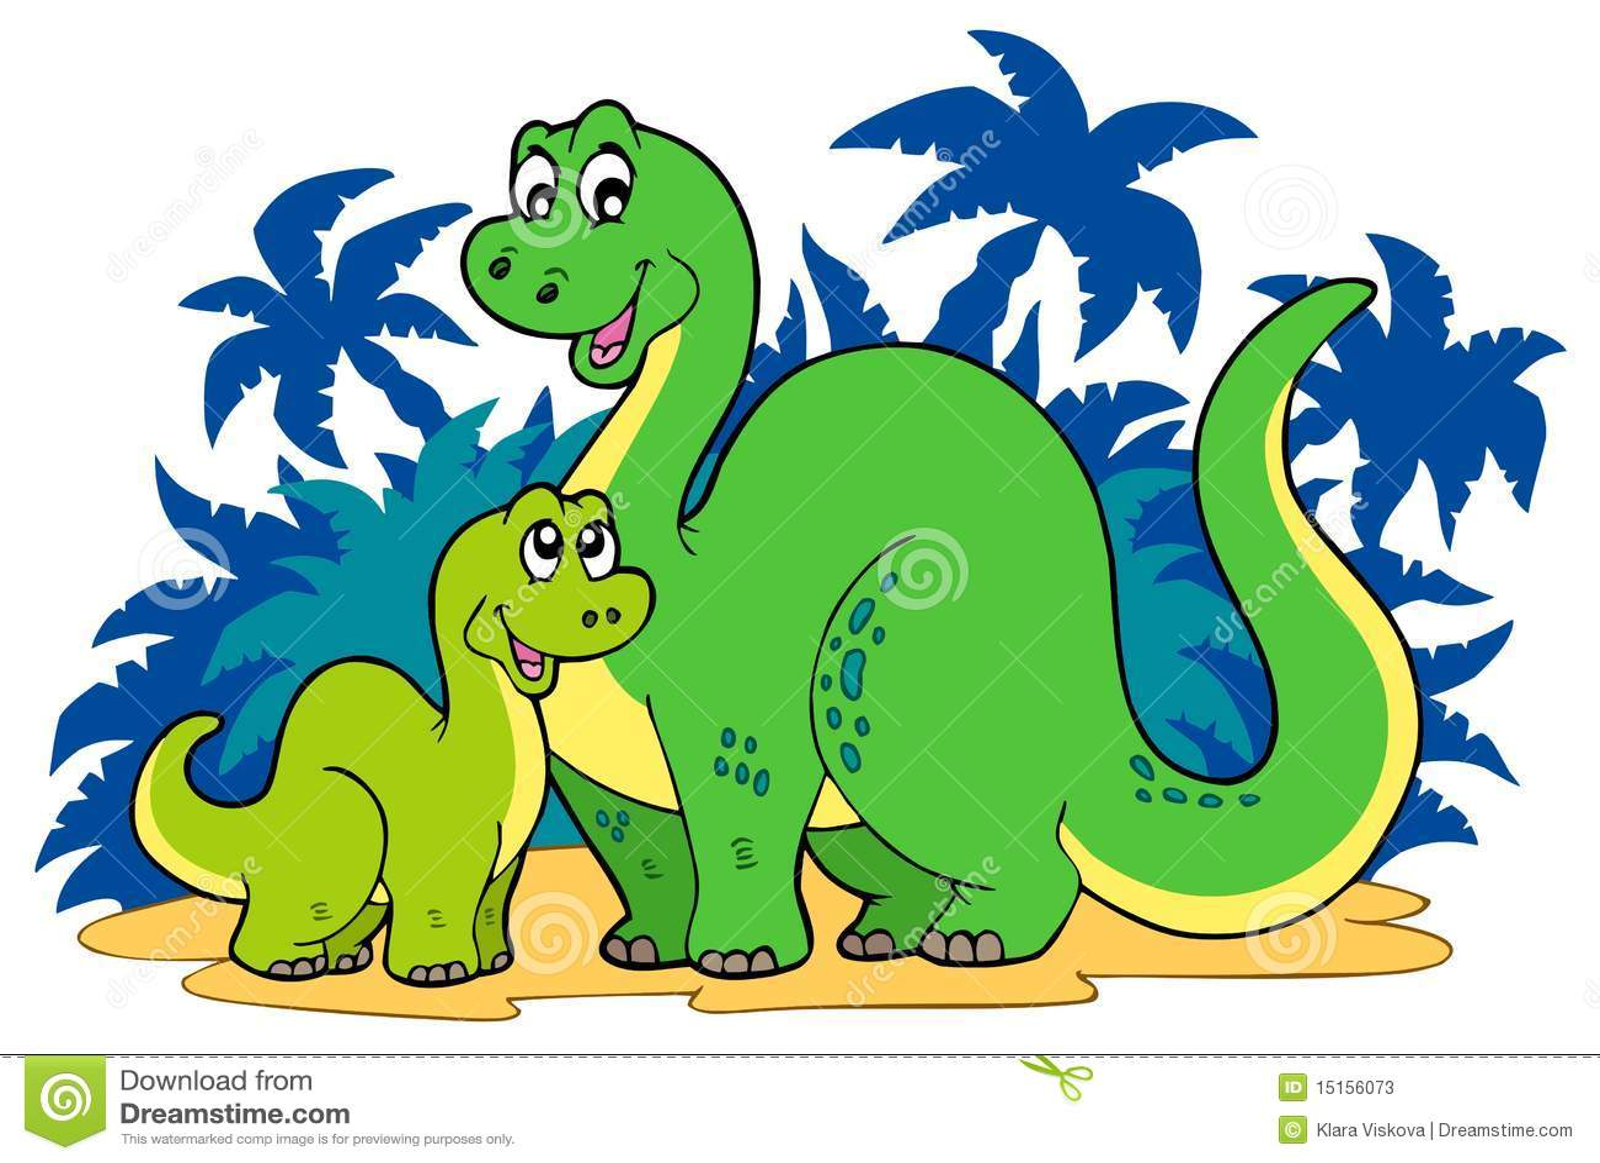 Cartoon Dinosaur Family Stock Photos - Image: 15156073